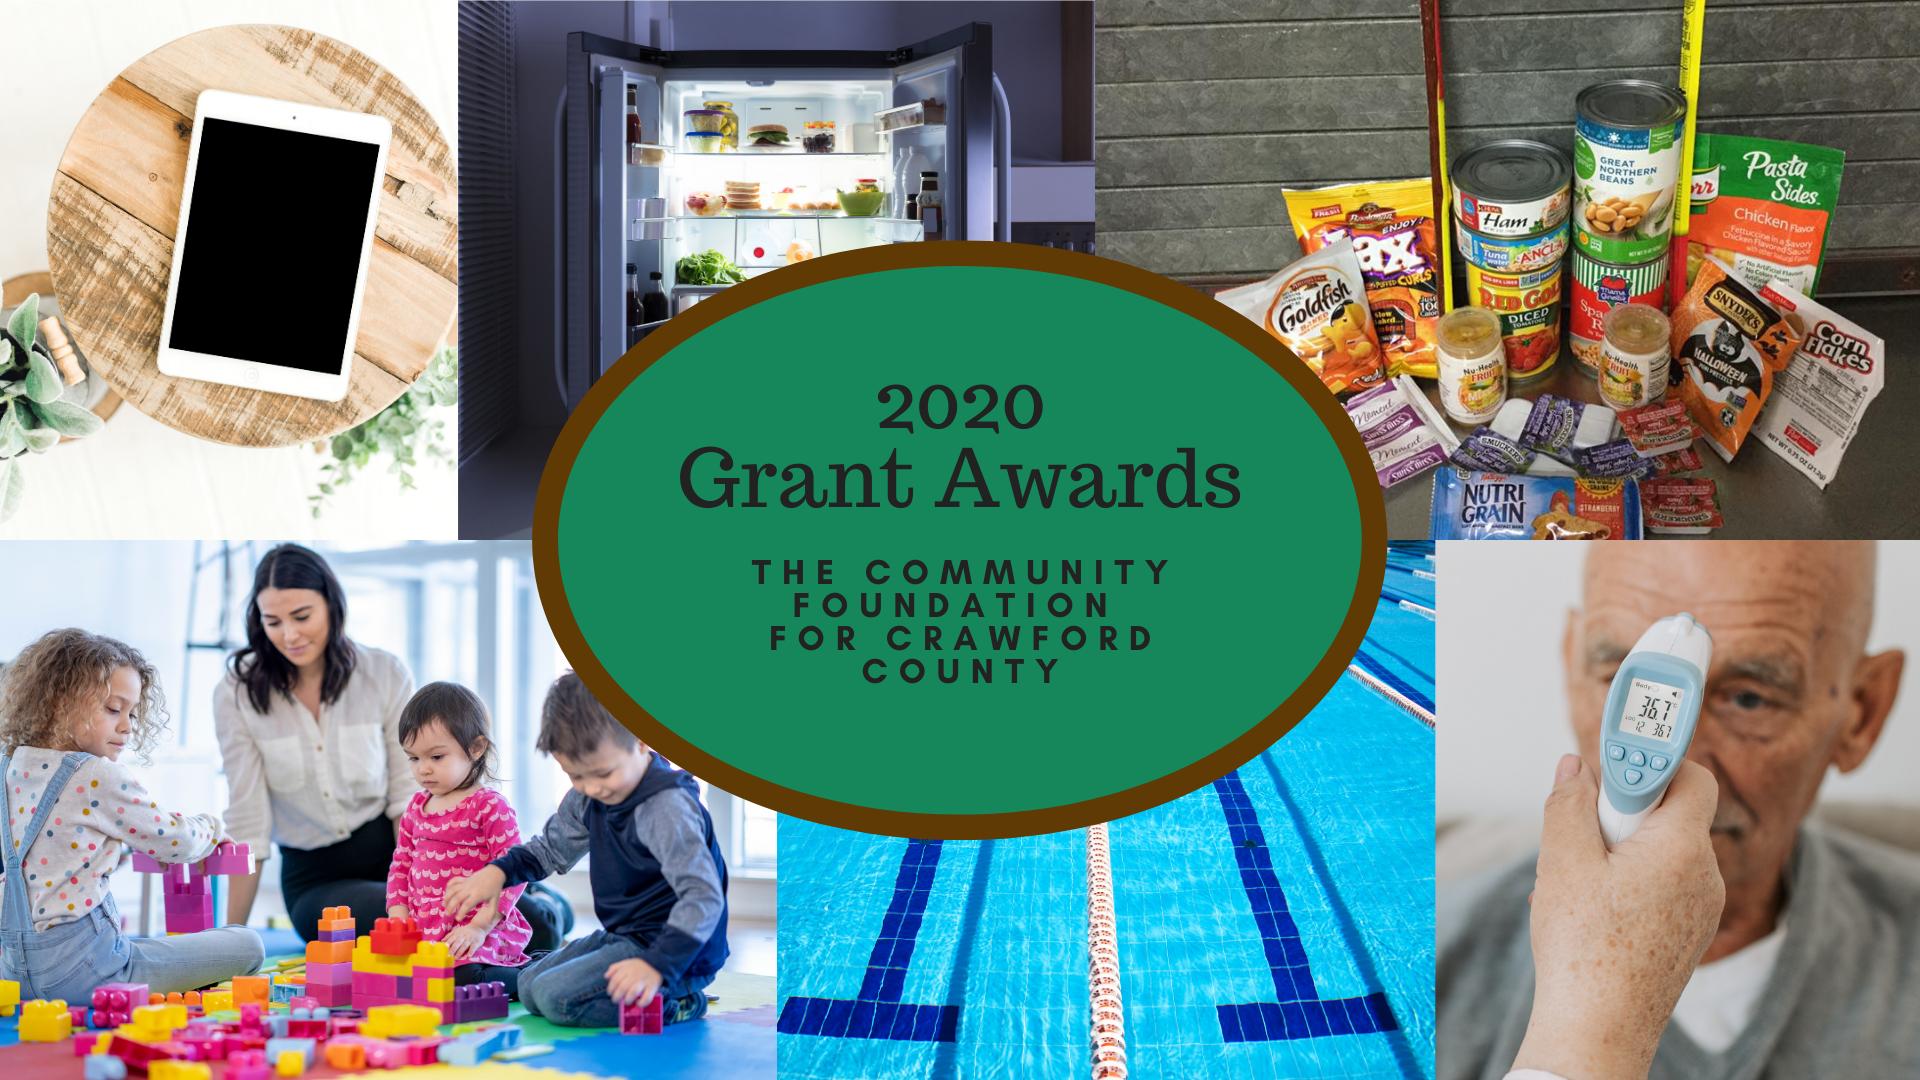 2020 Grant Awards Facebook Ad